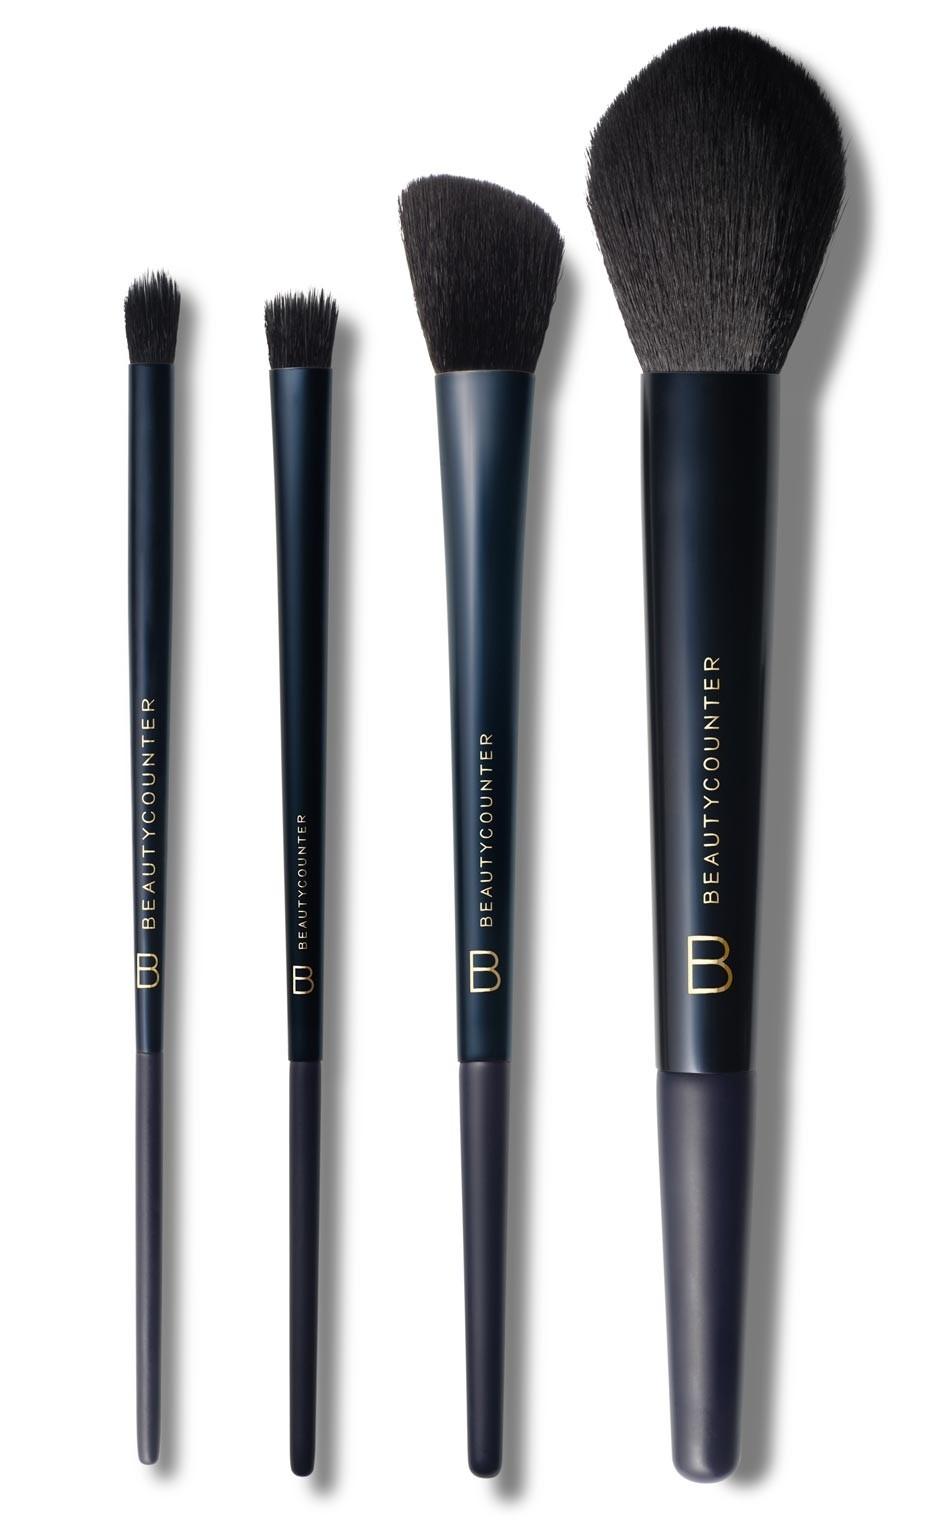 Best of Brushes Set - $58